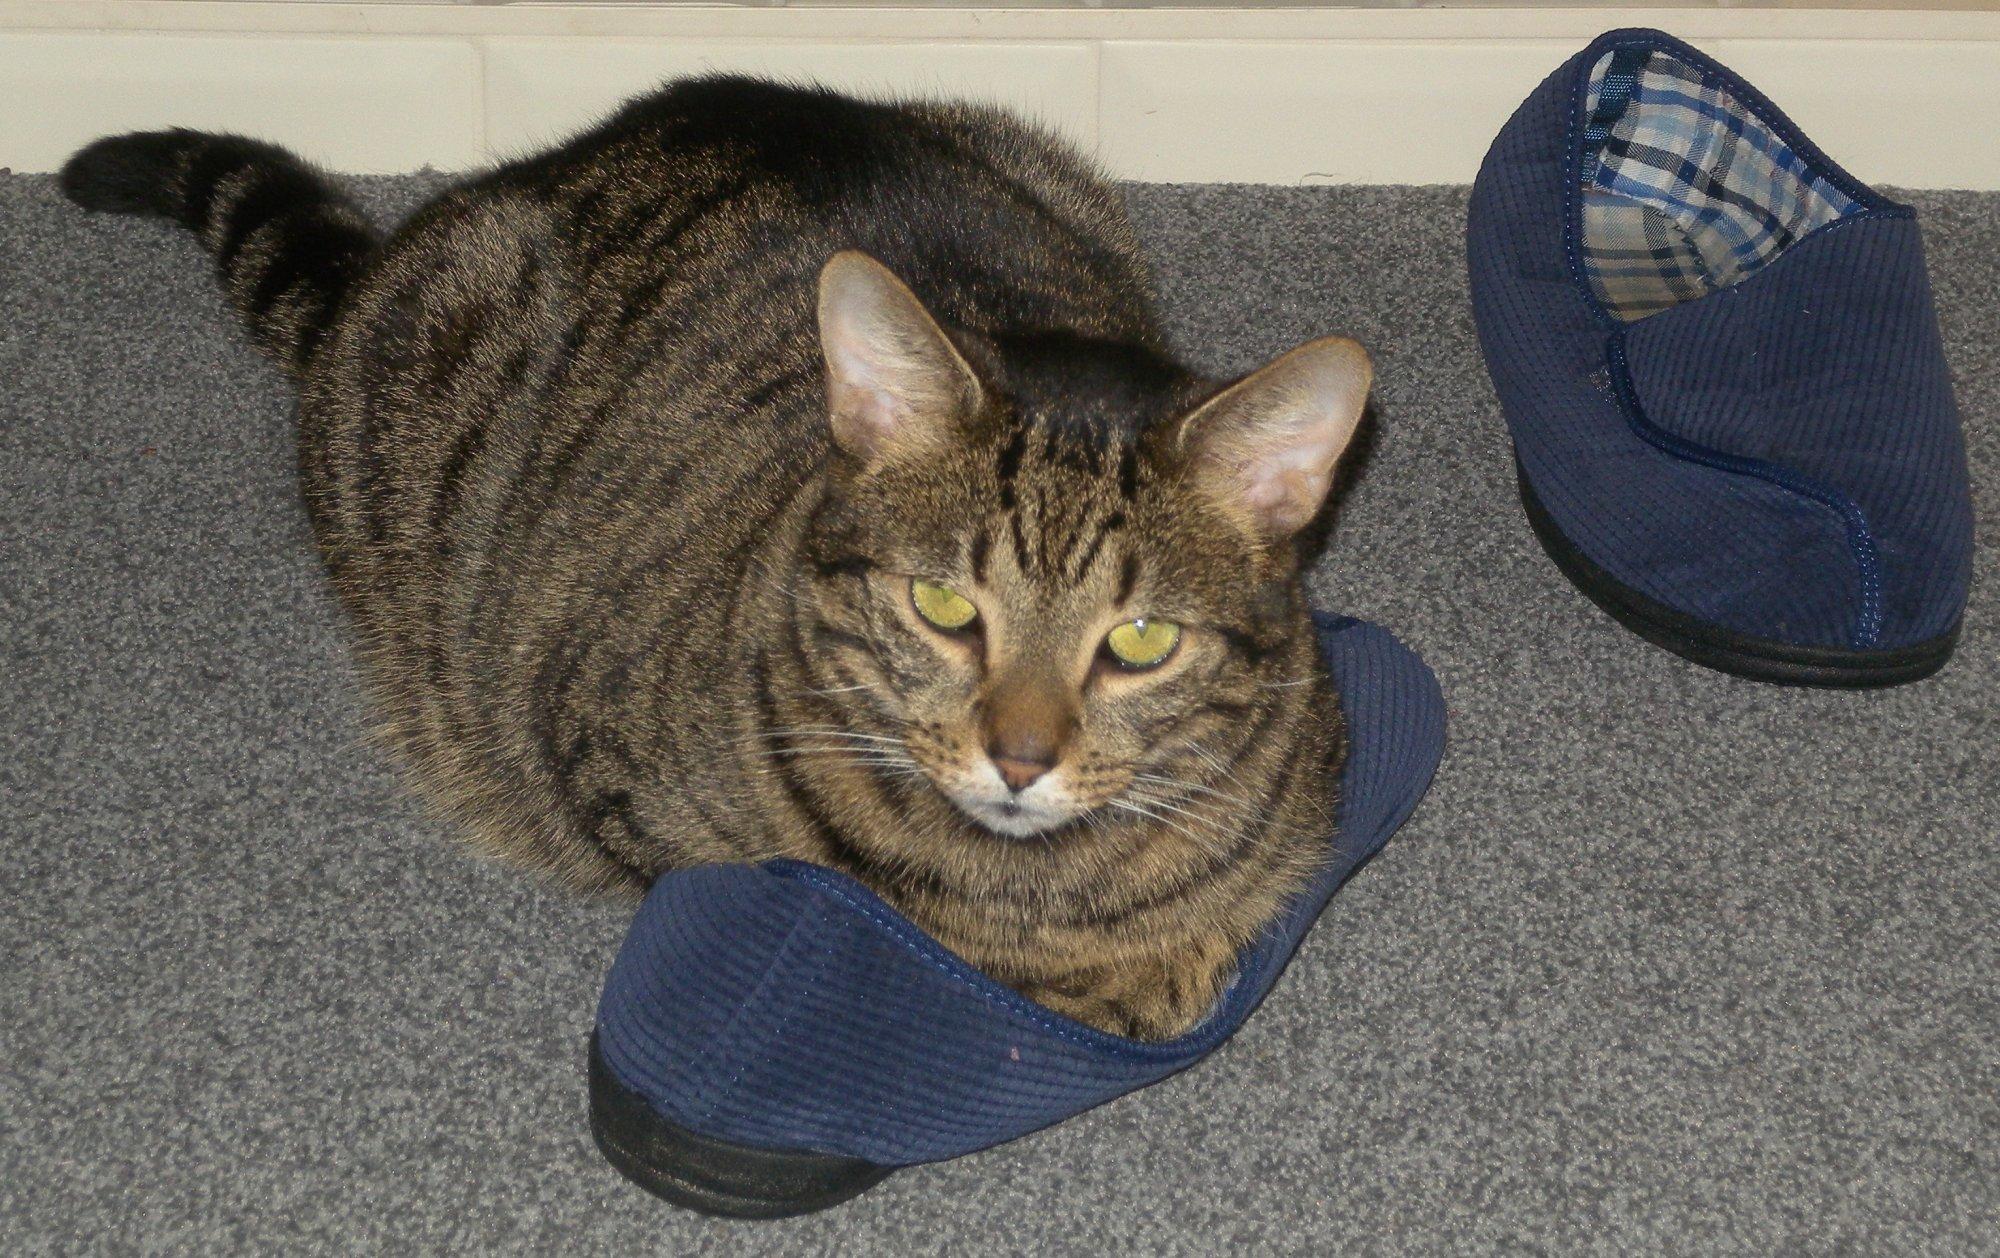 Slippercat